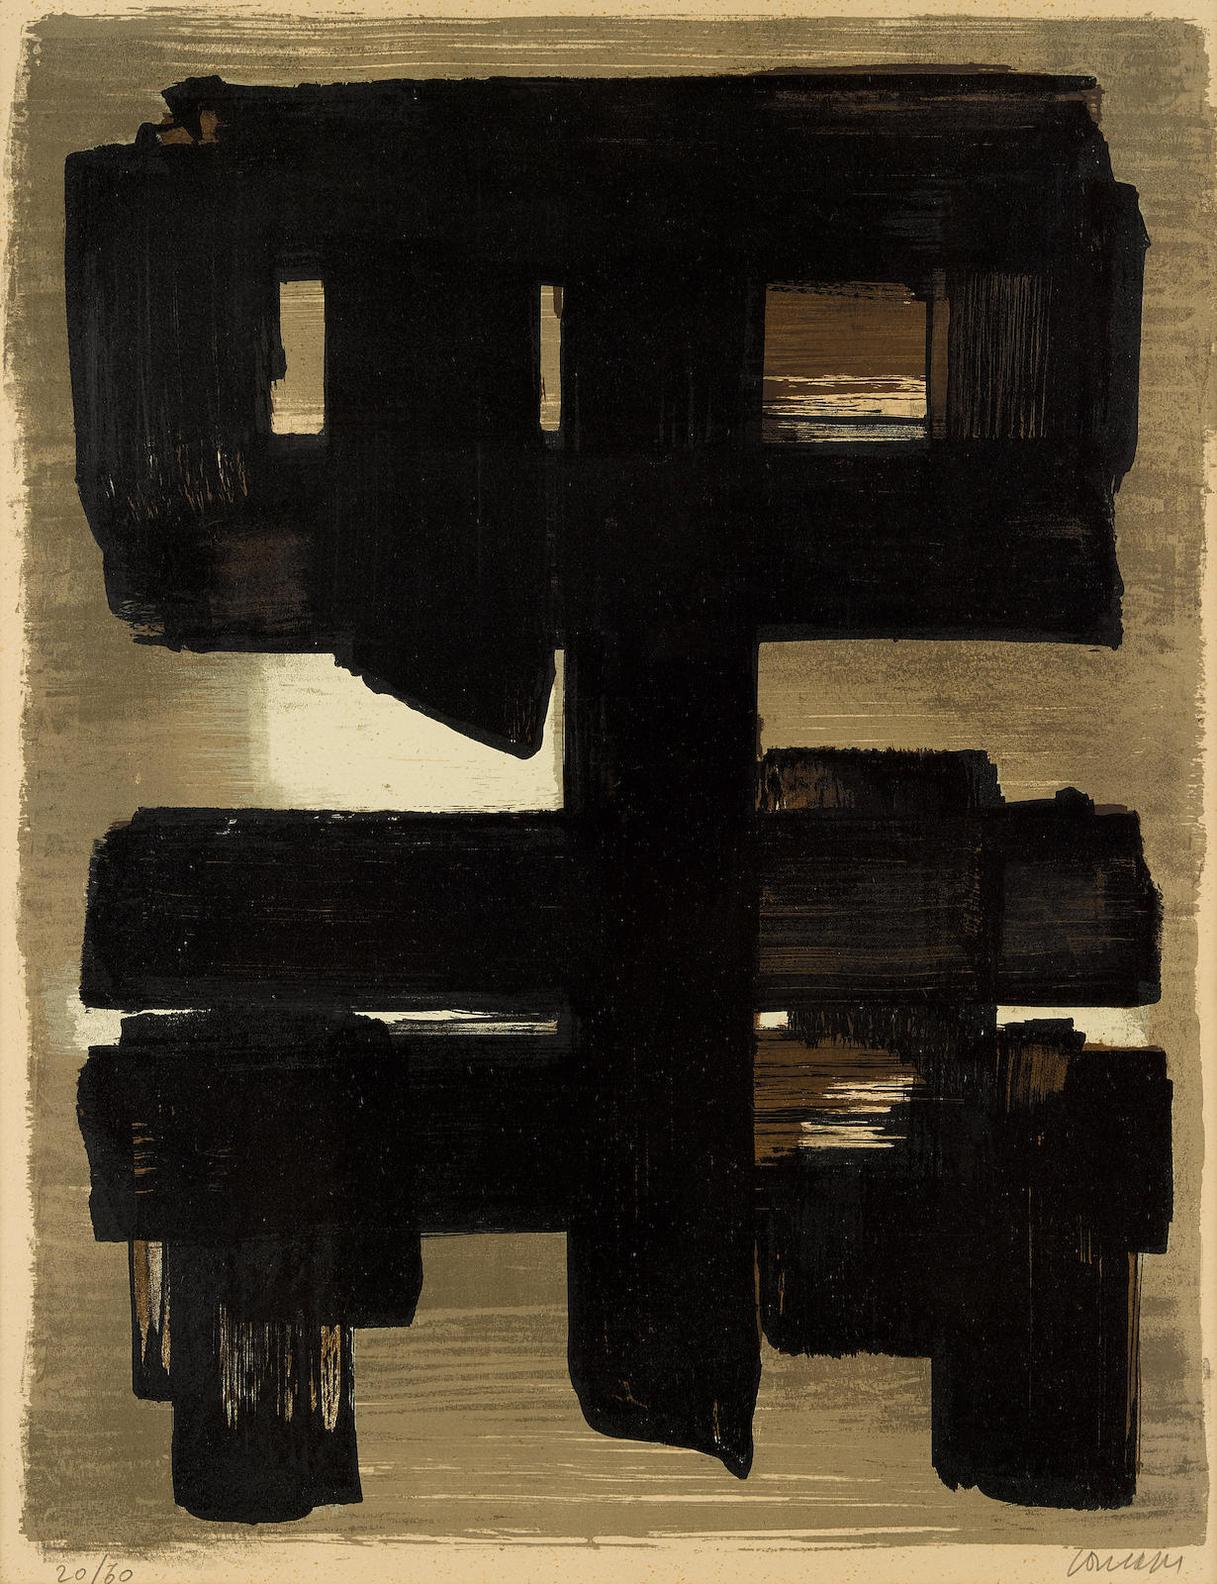 Pierre Soulages-Lithographie No. 1 (H. 1)-1957